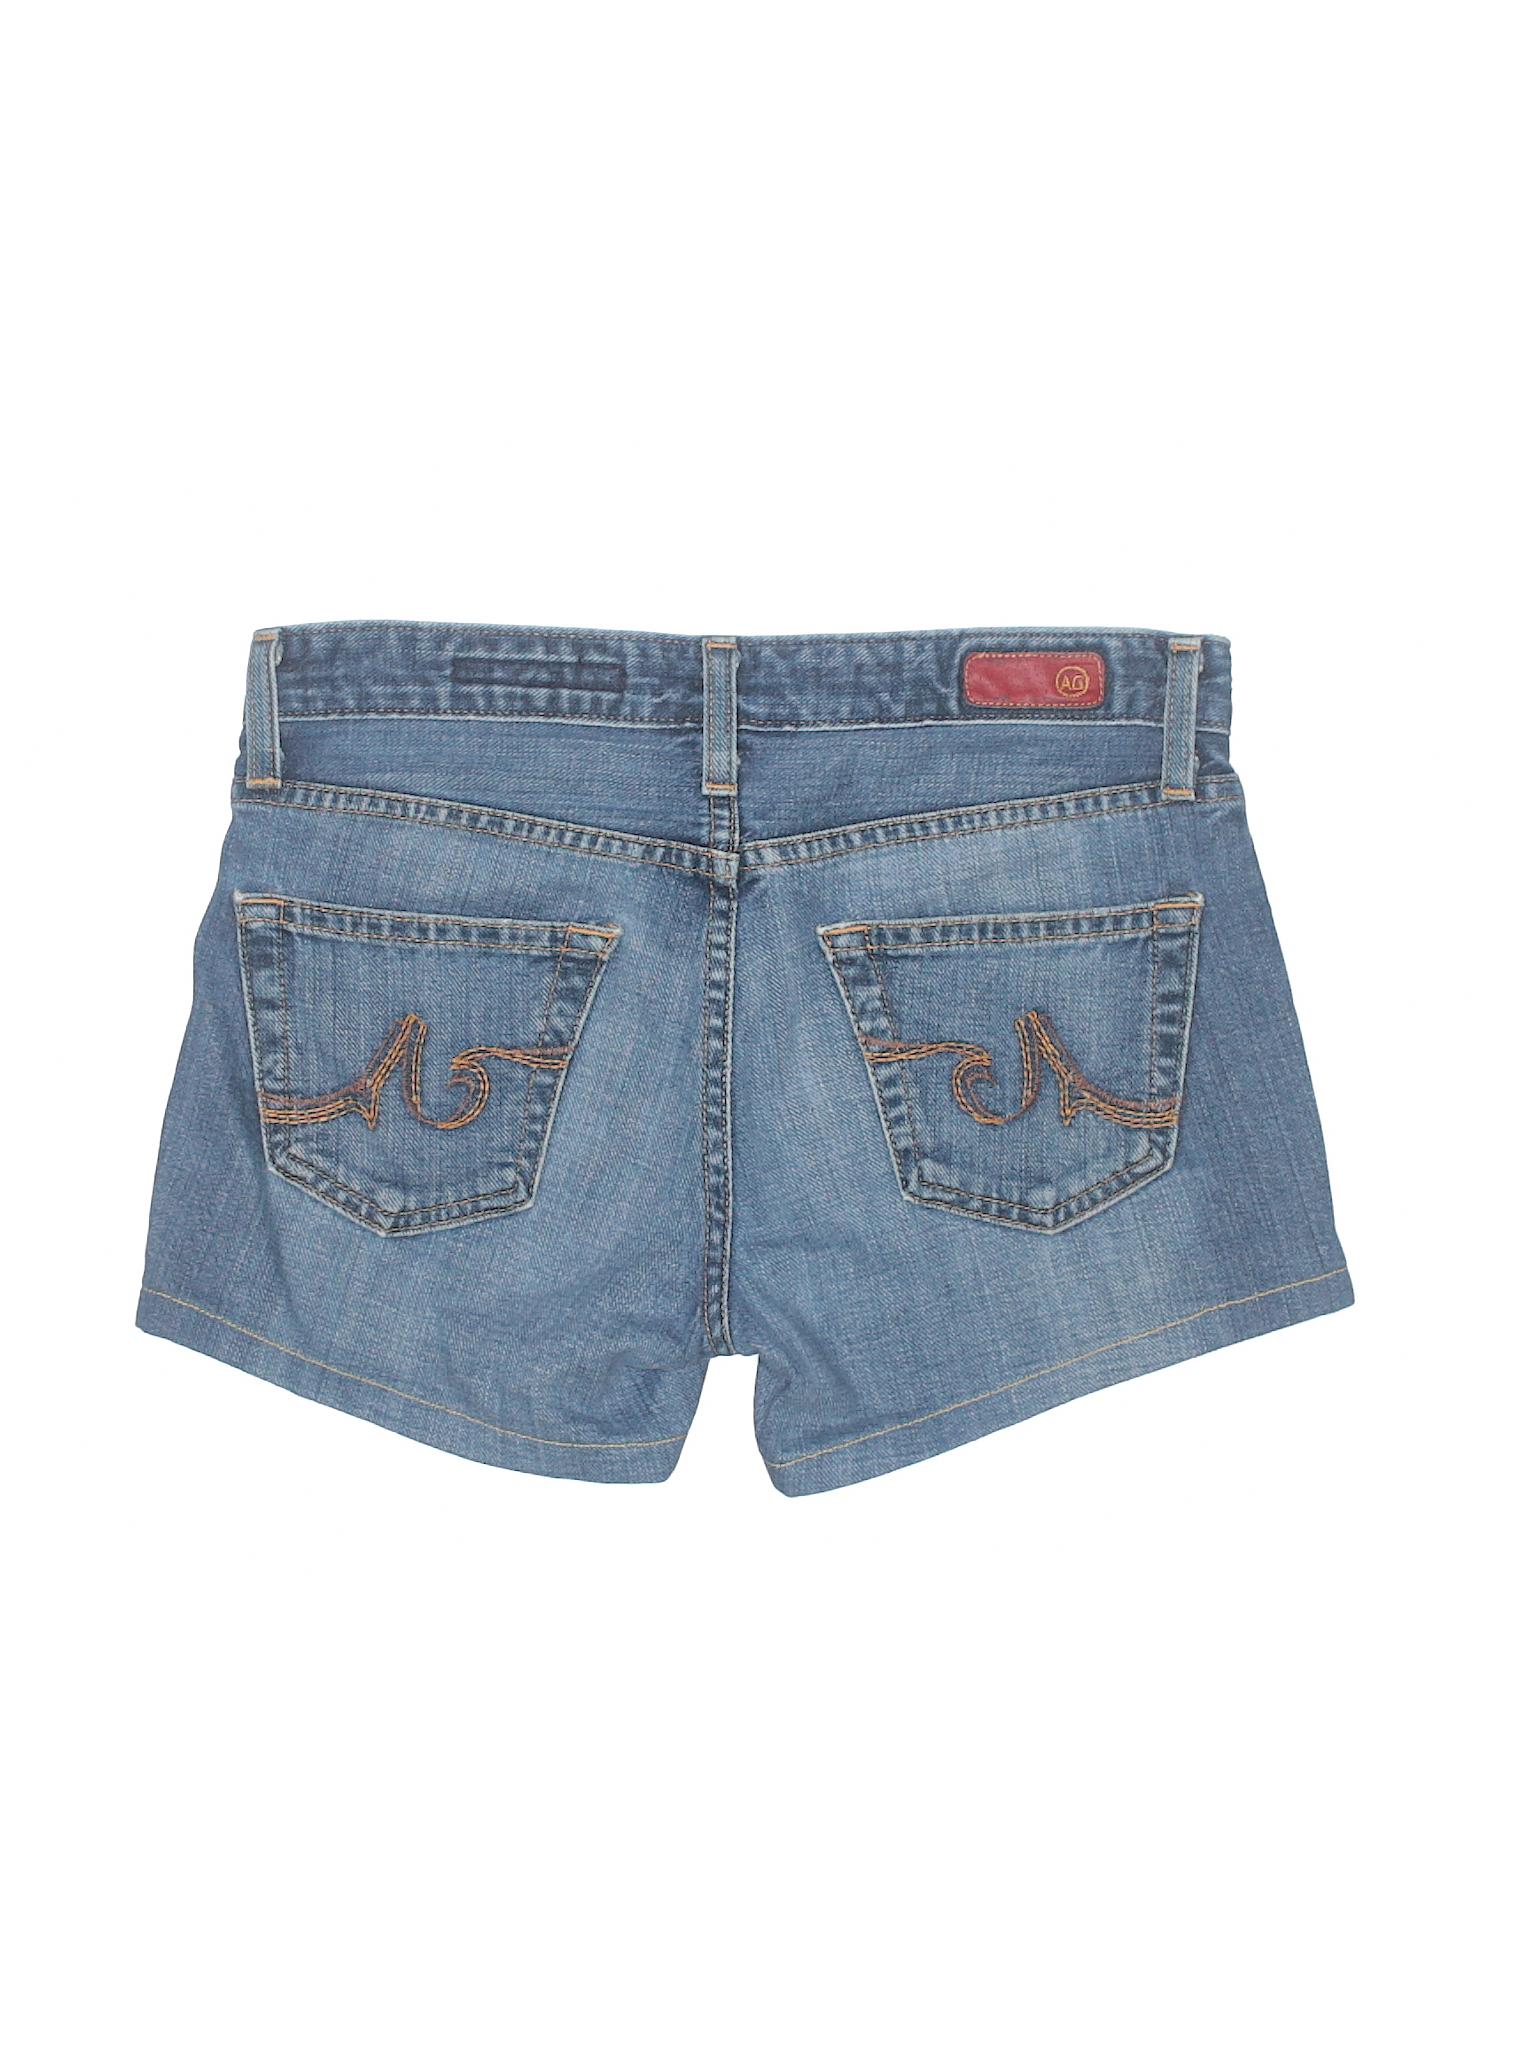 Fabrics Denim AG Shorts Liberty Goldschmied Boutique Art Adriano SgqnX